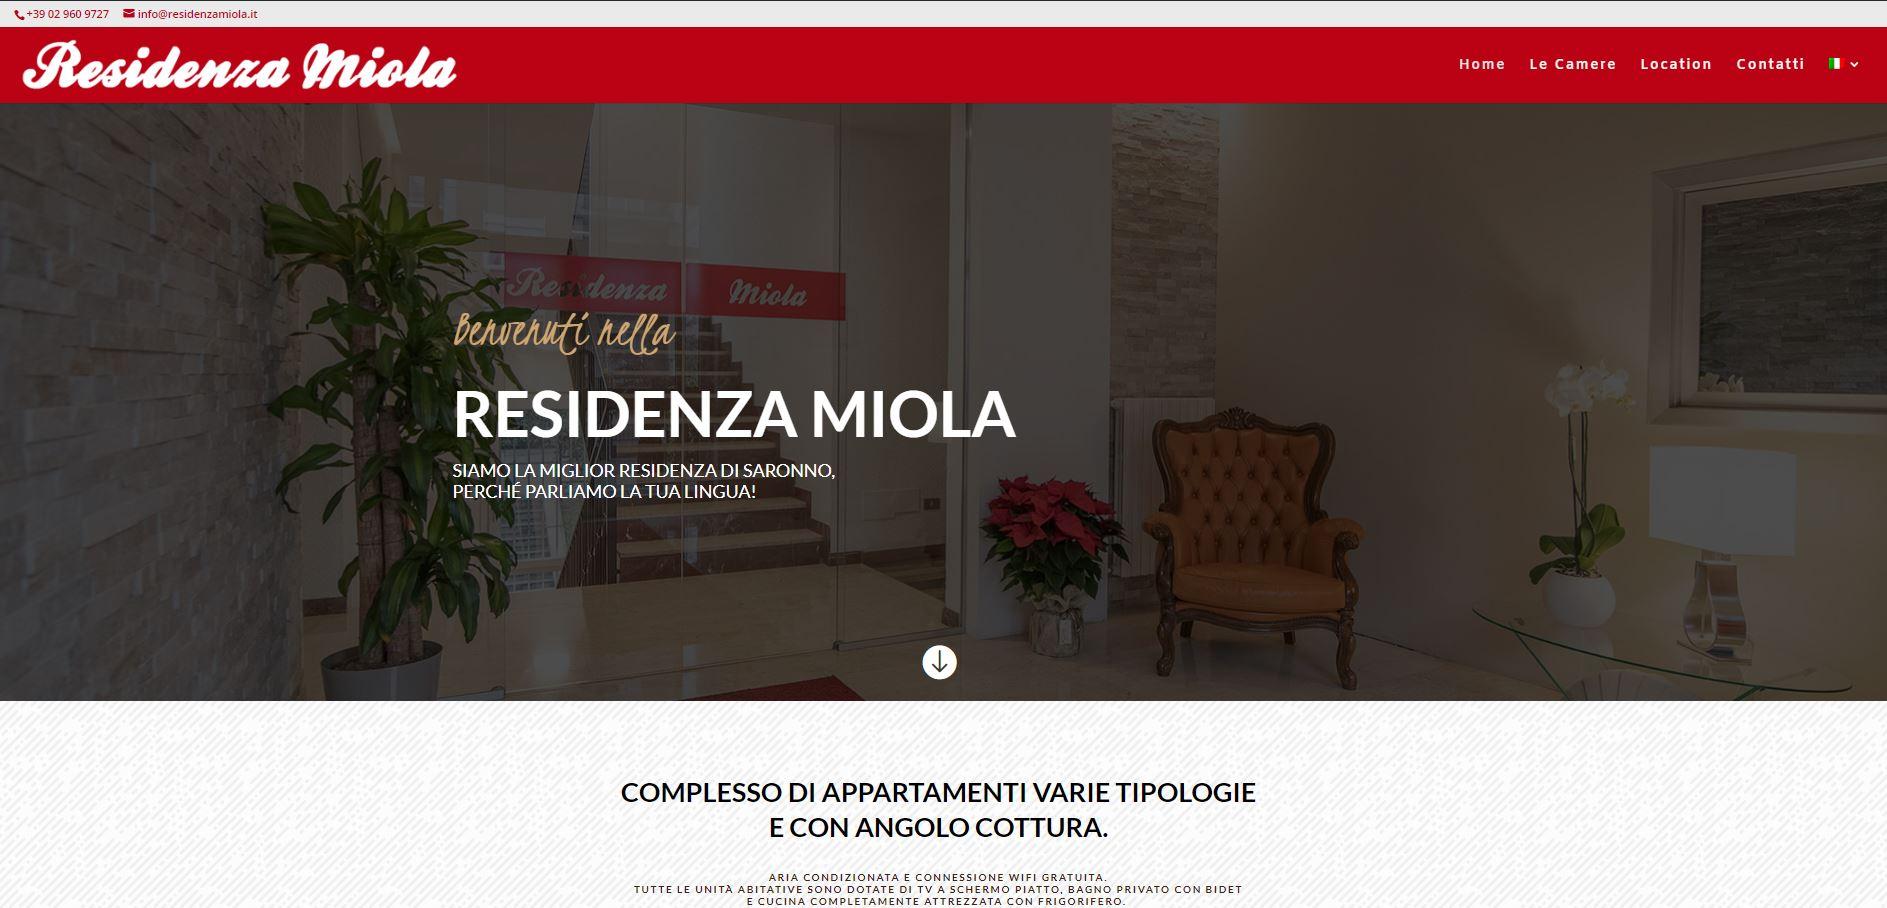 Residenza Miola